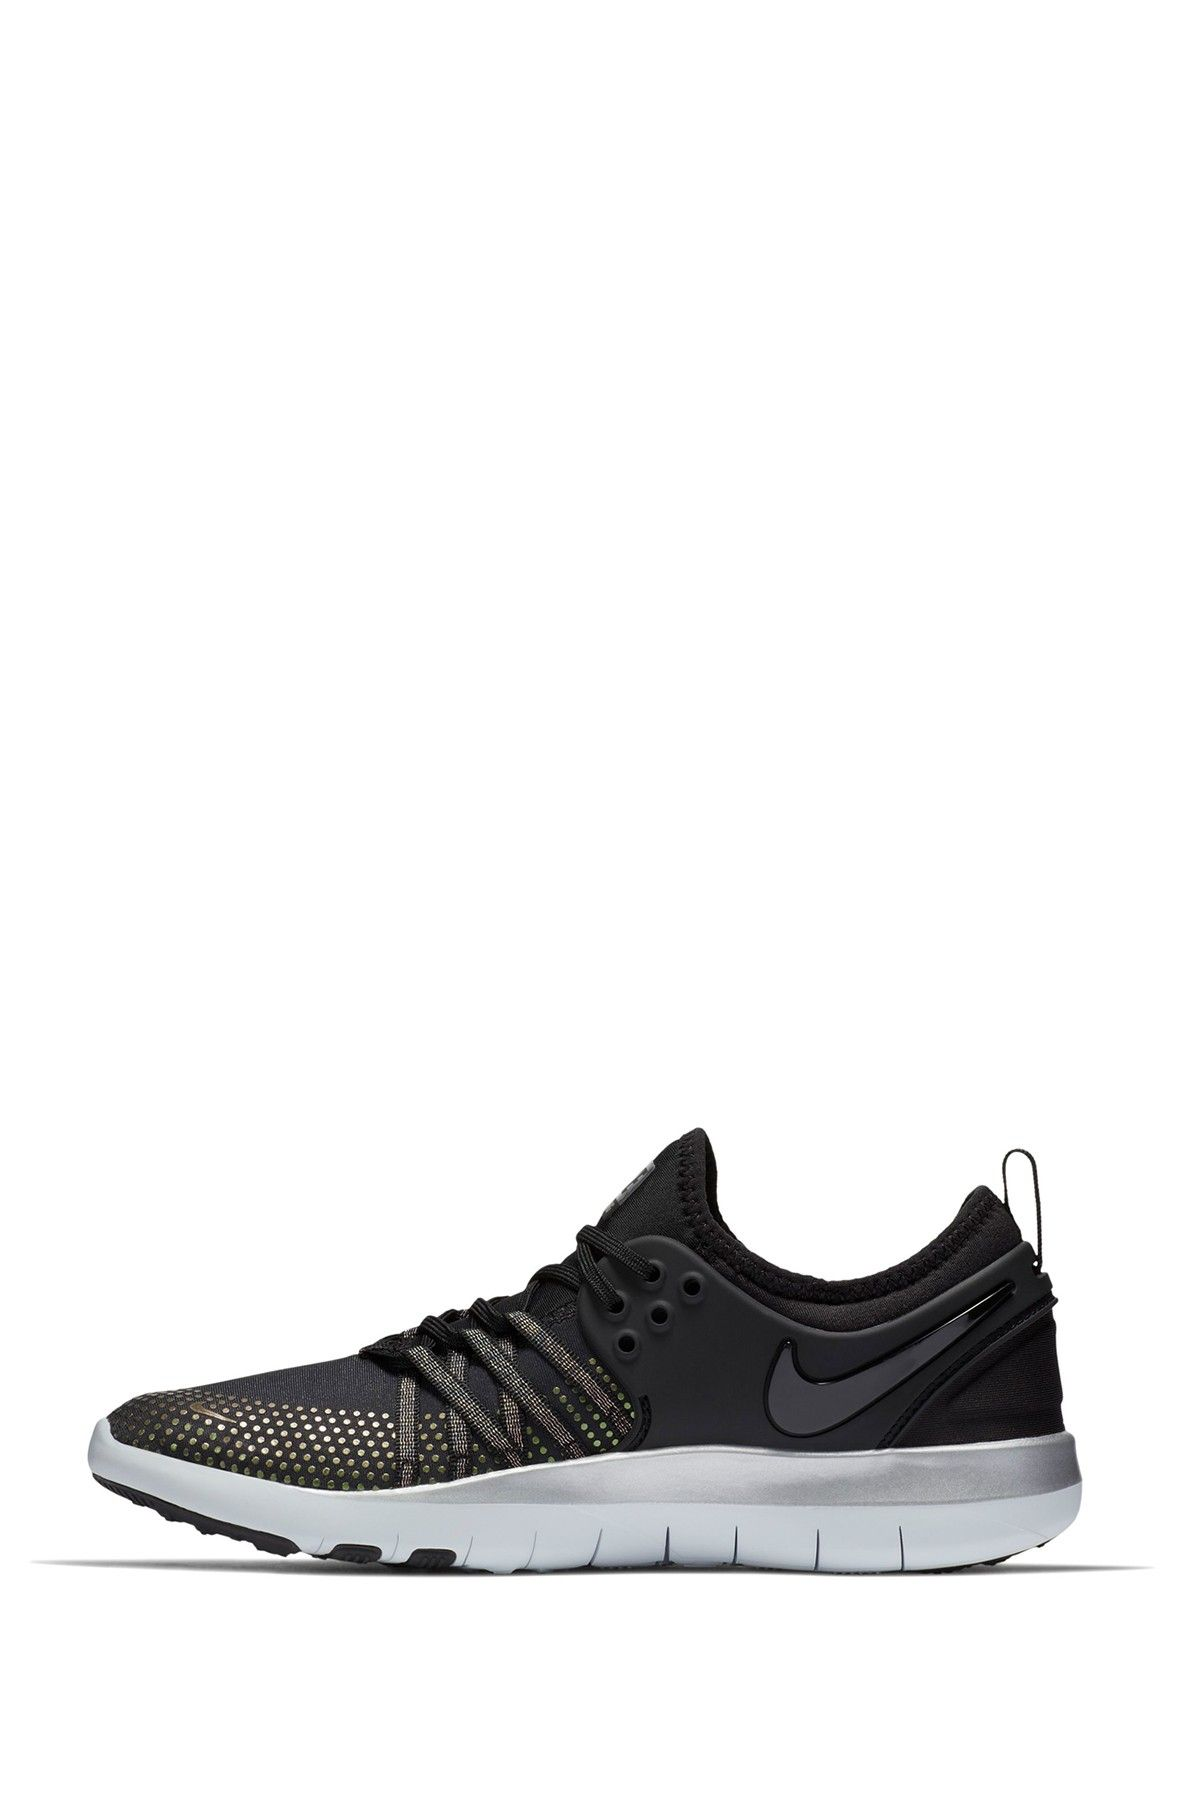 Nike   Free TR 7 MTLC Training Sneaker